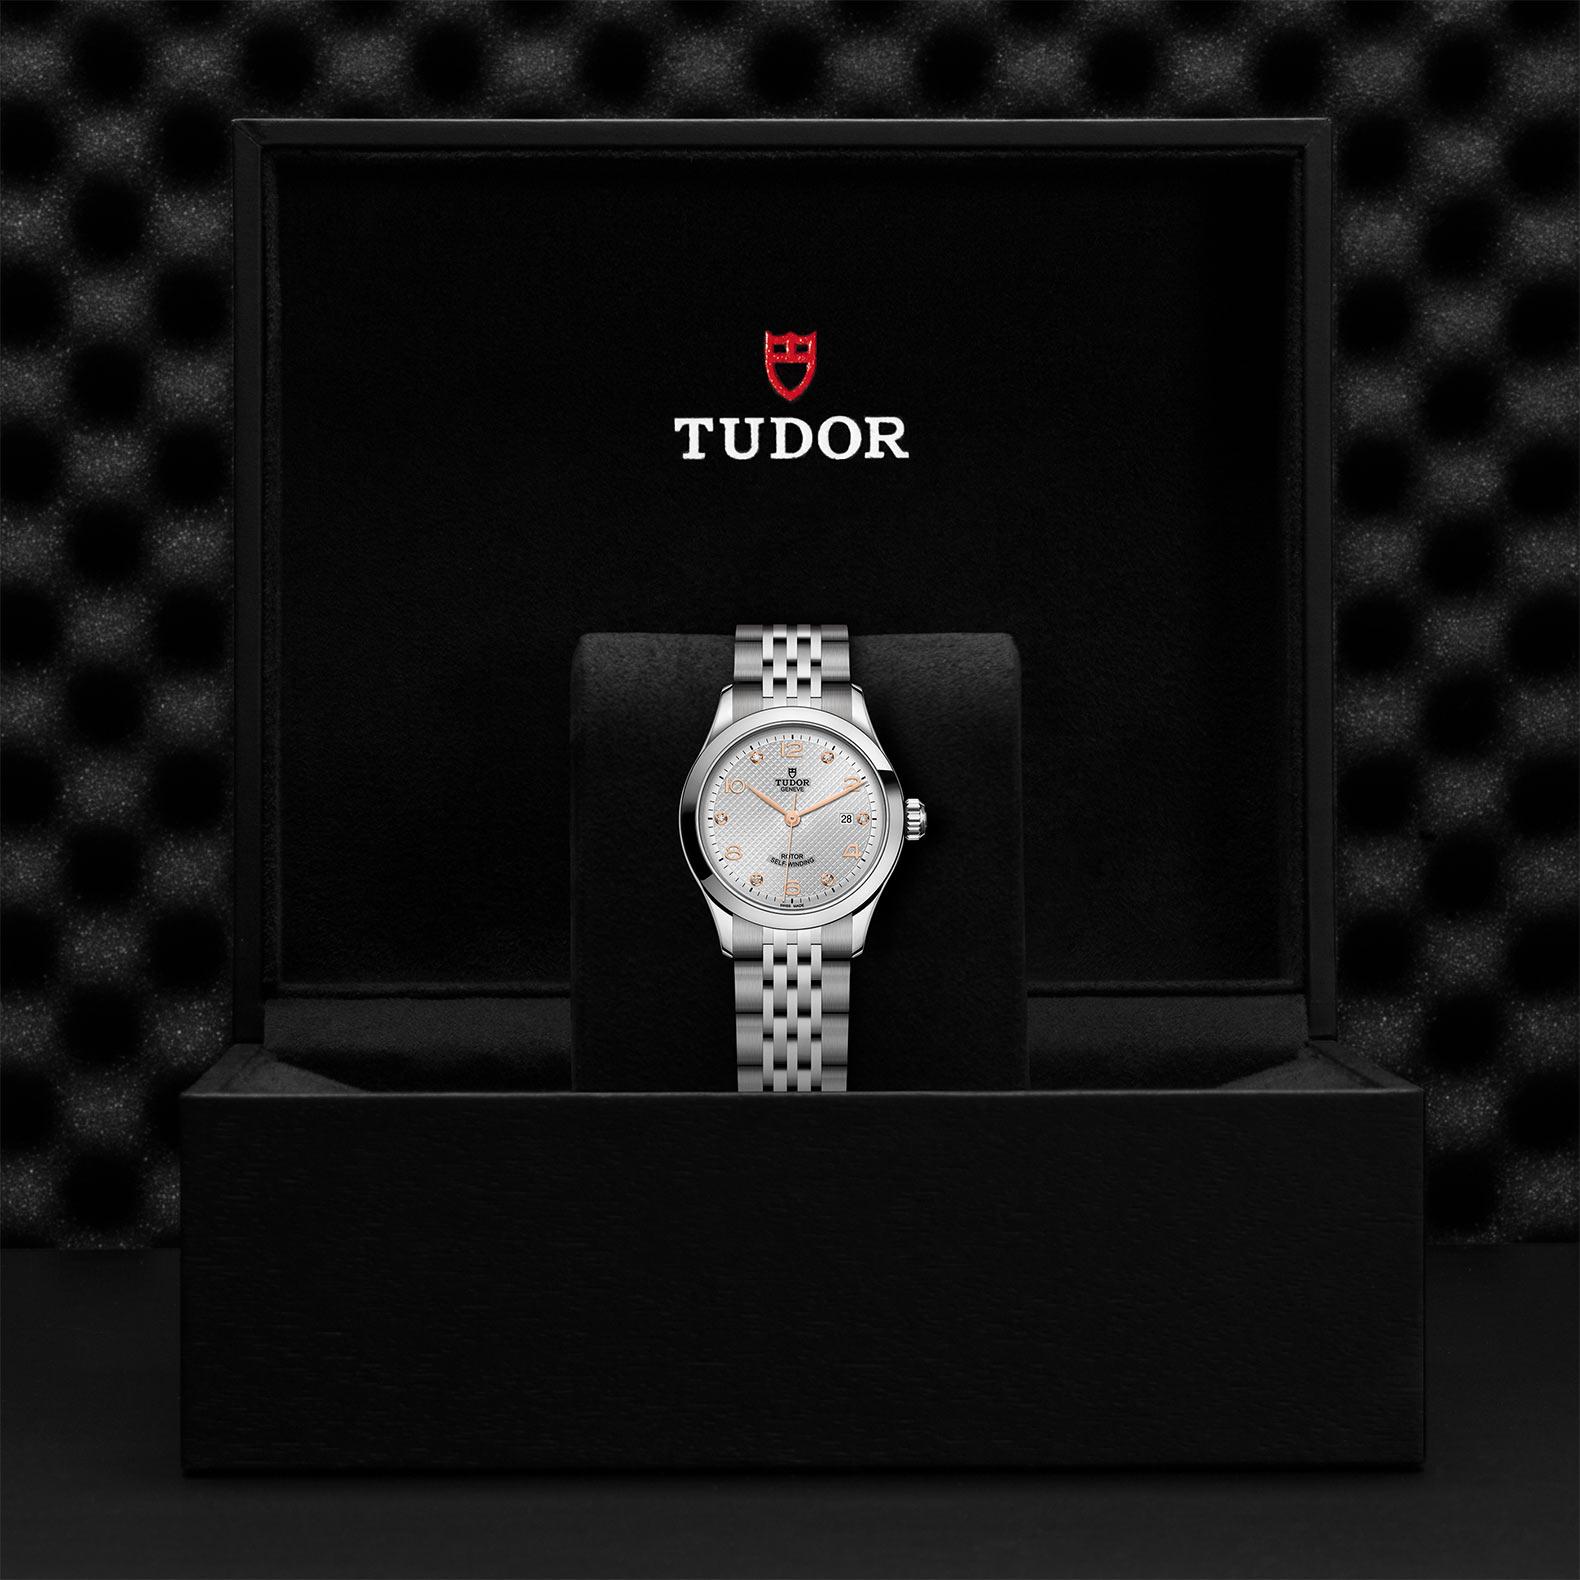 TUDOR 1926 - M91350-0003